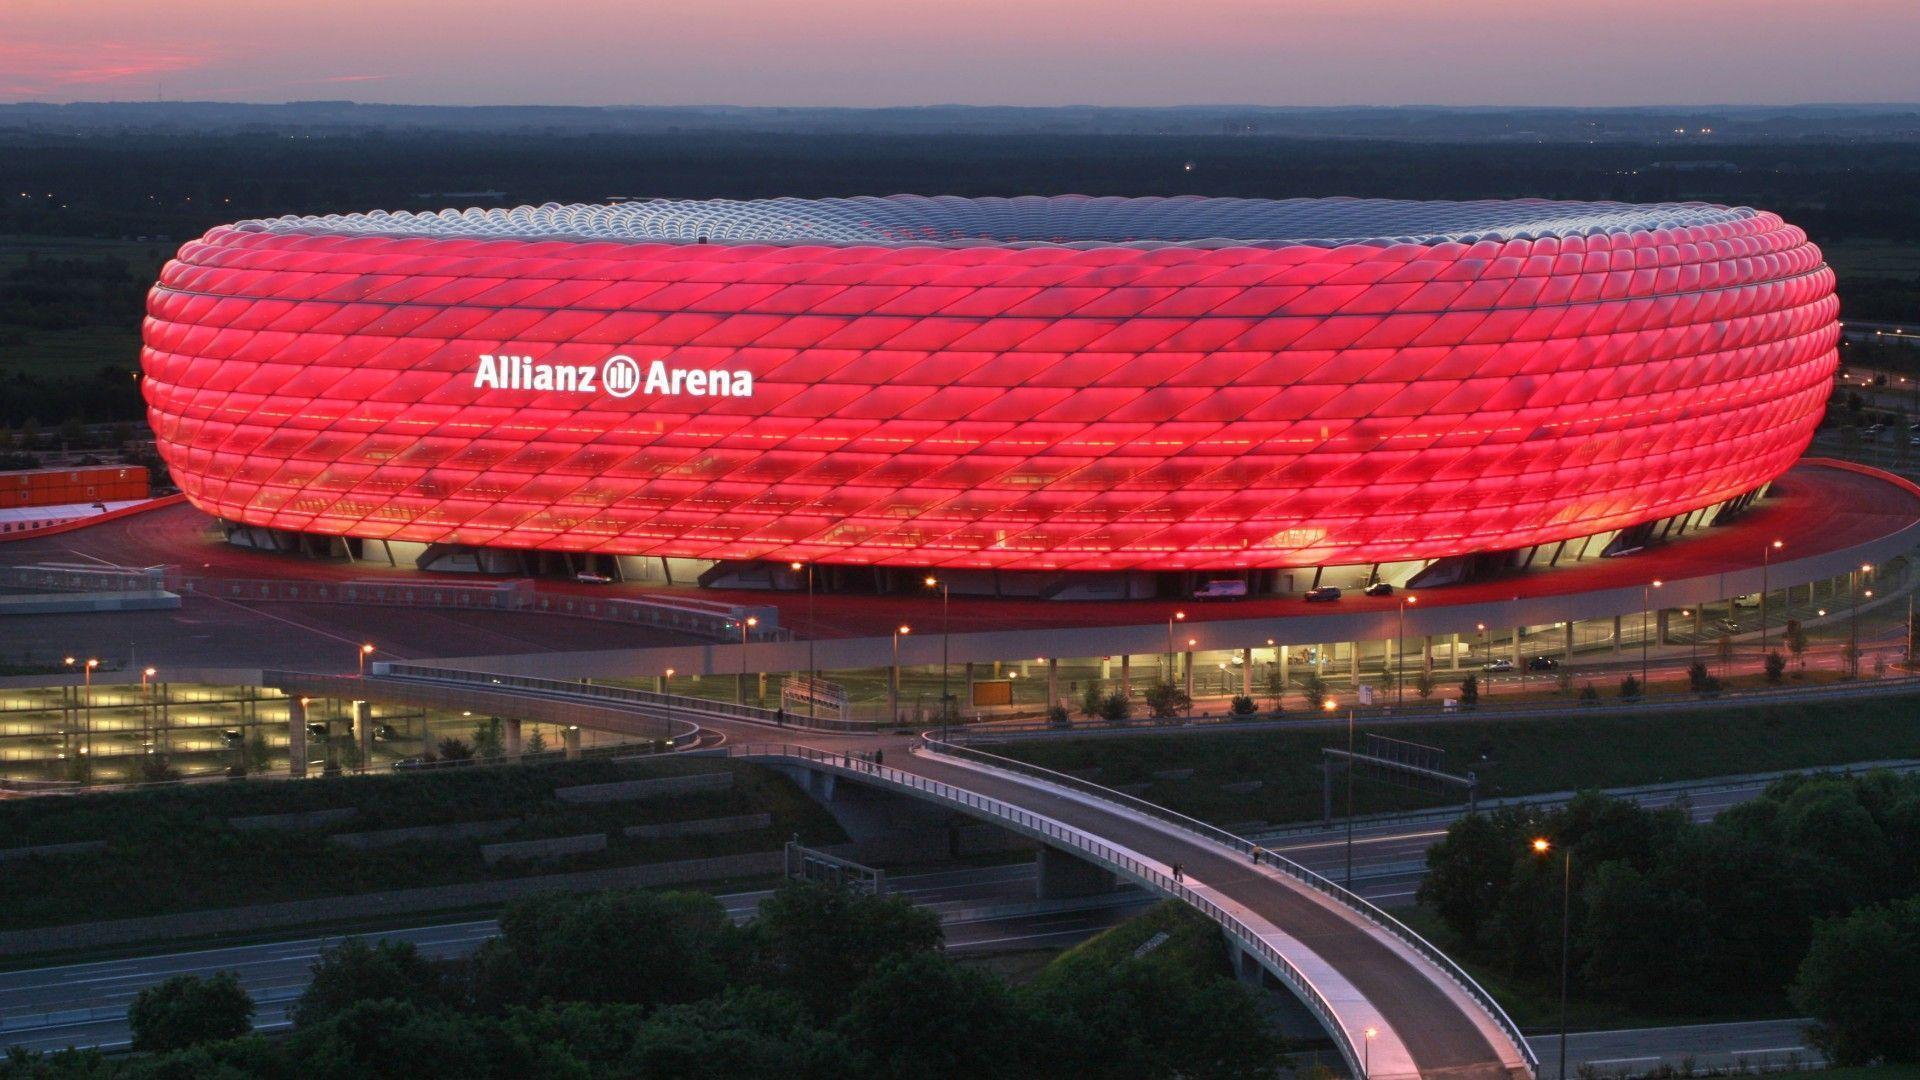 Hd-Arena